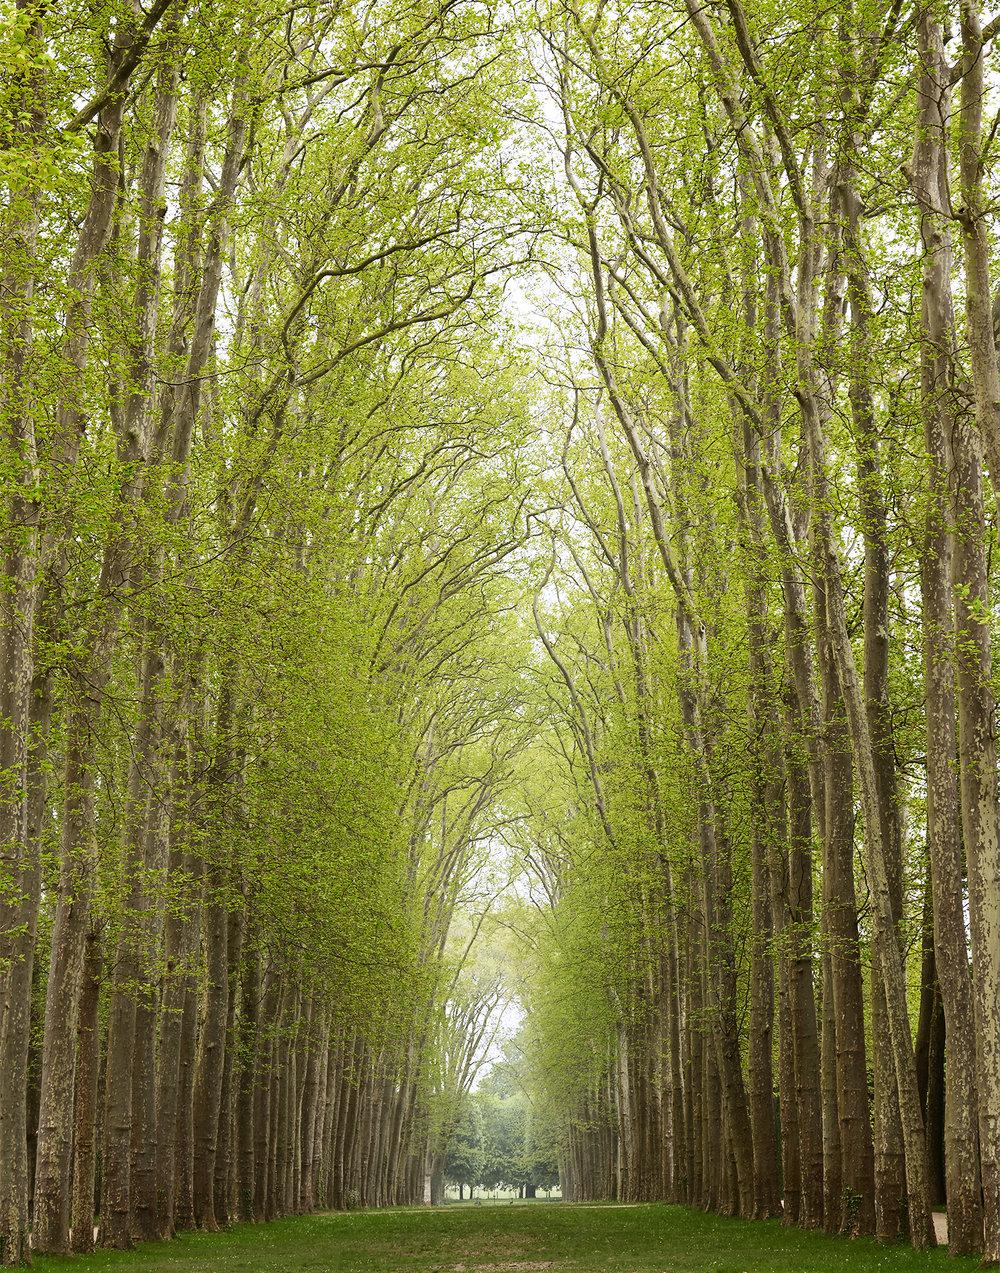 Trees in Versailles